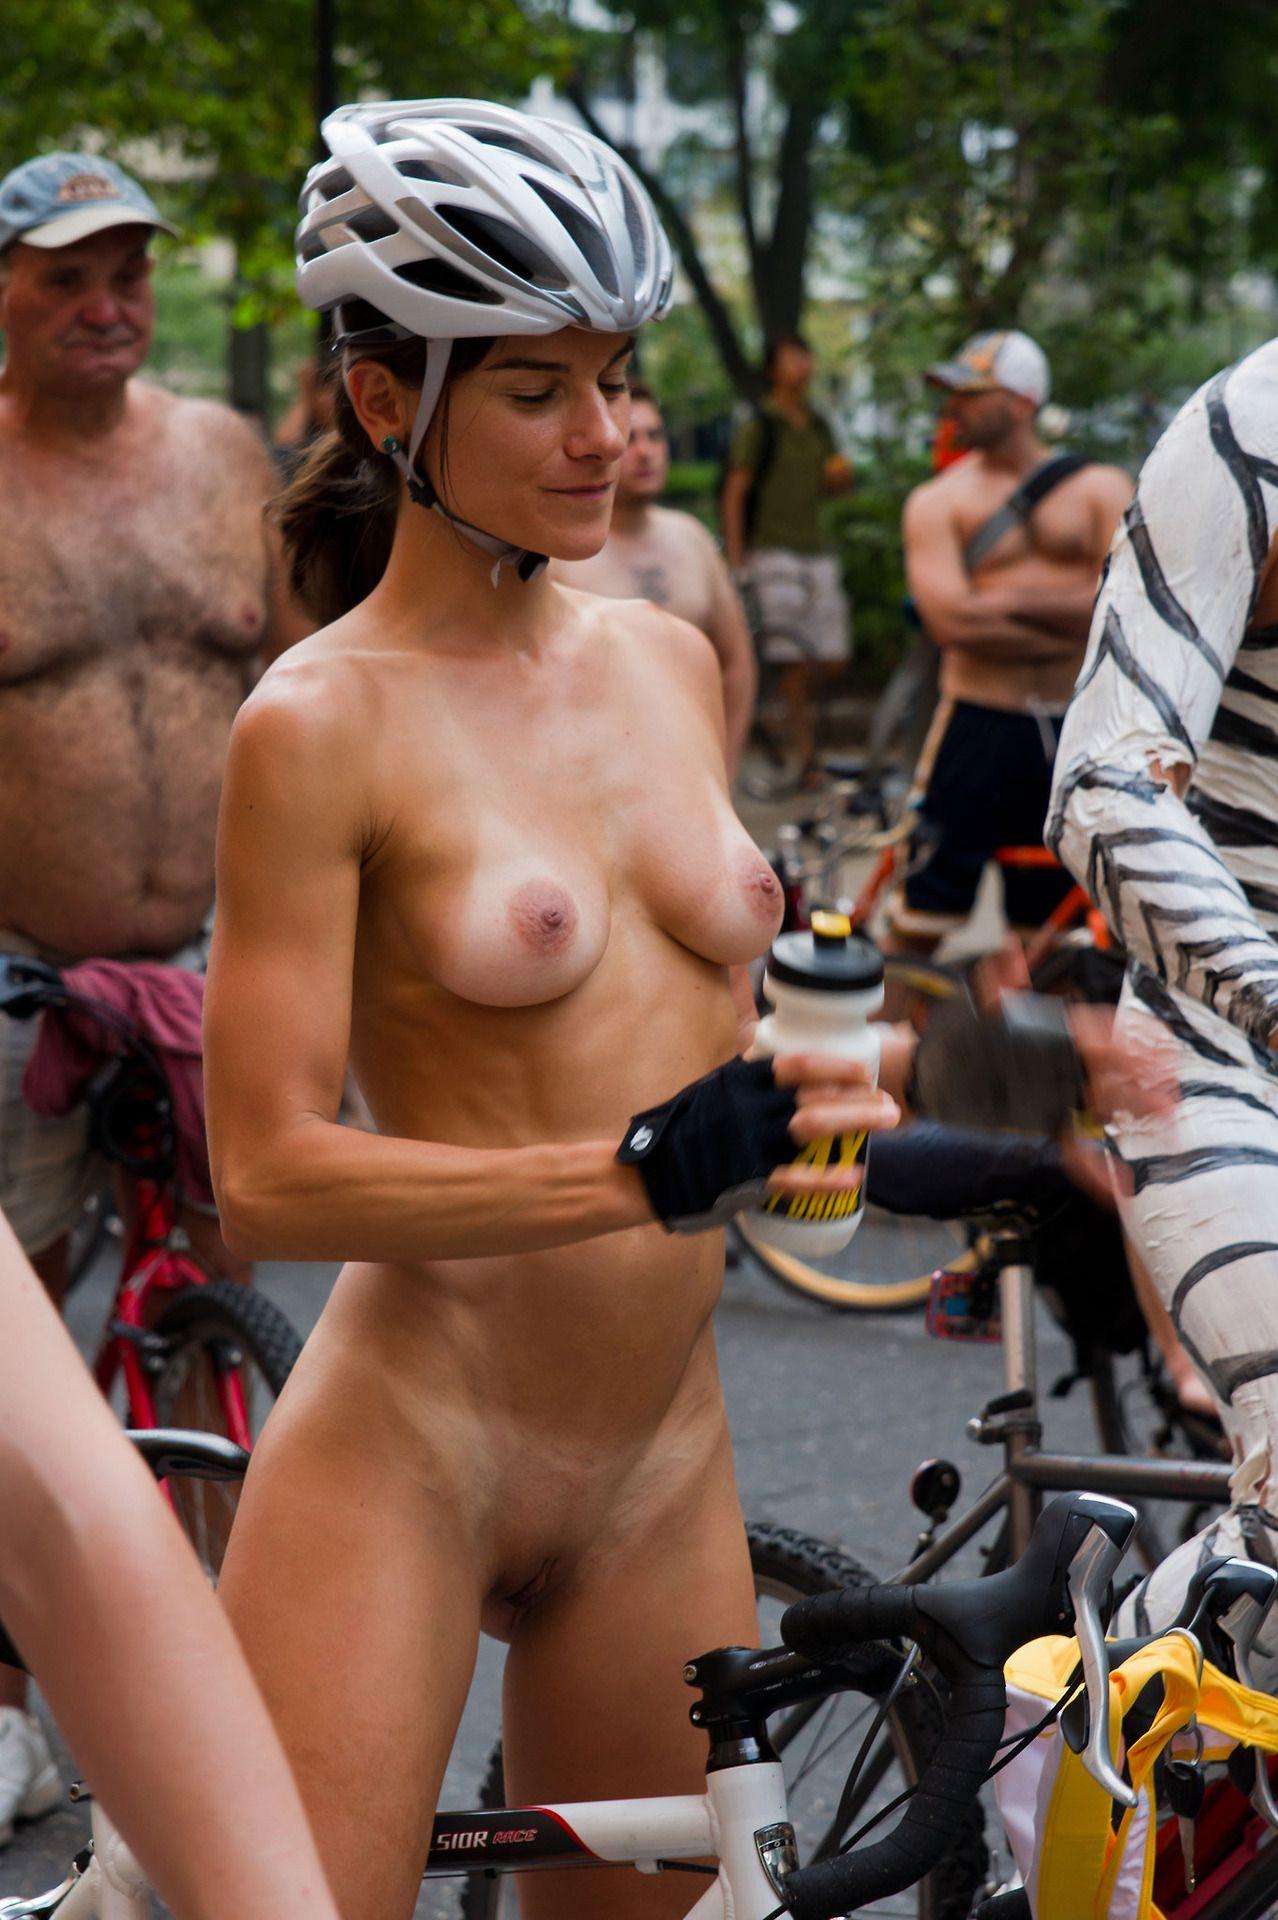 Bike girls nude World Naked